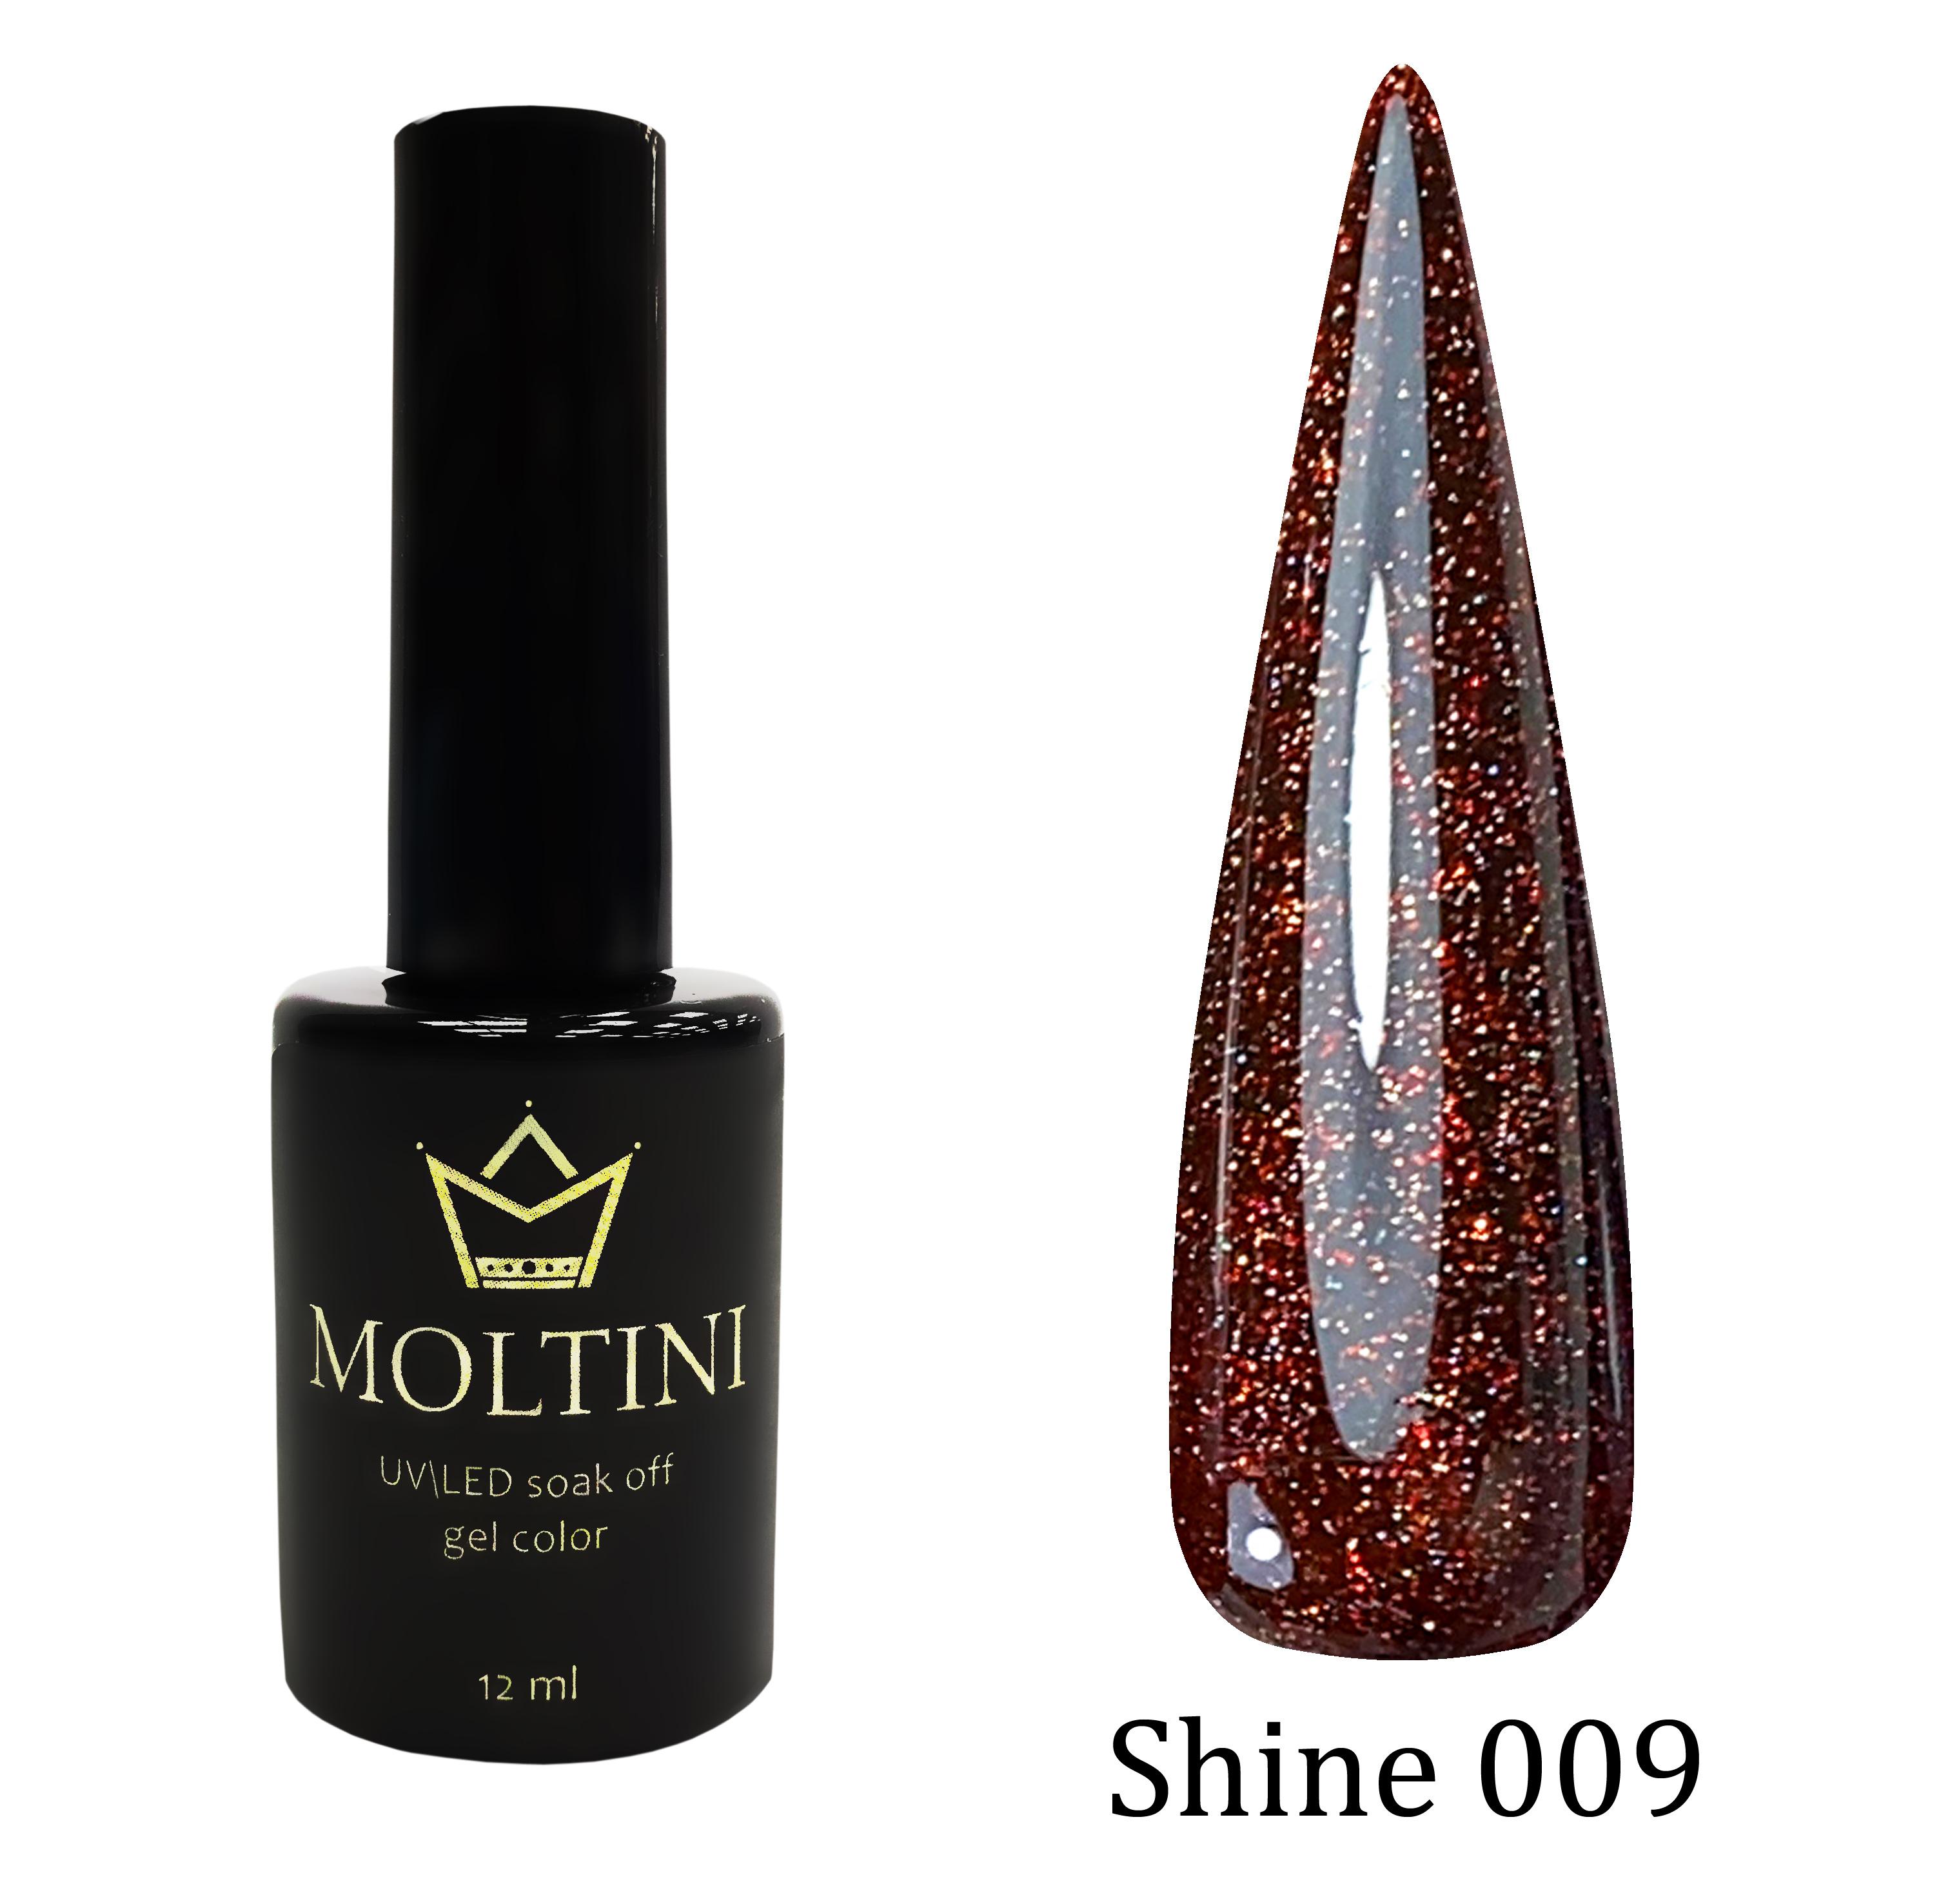 Гель-лак Moltini Shine 009, 12 ml